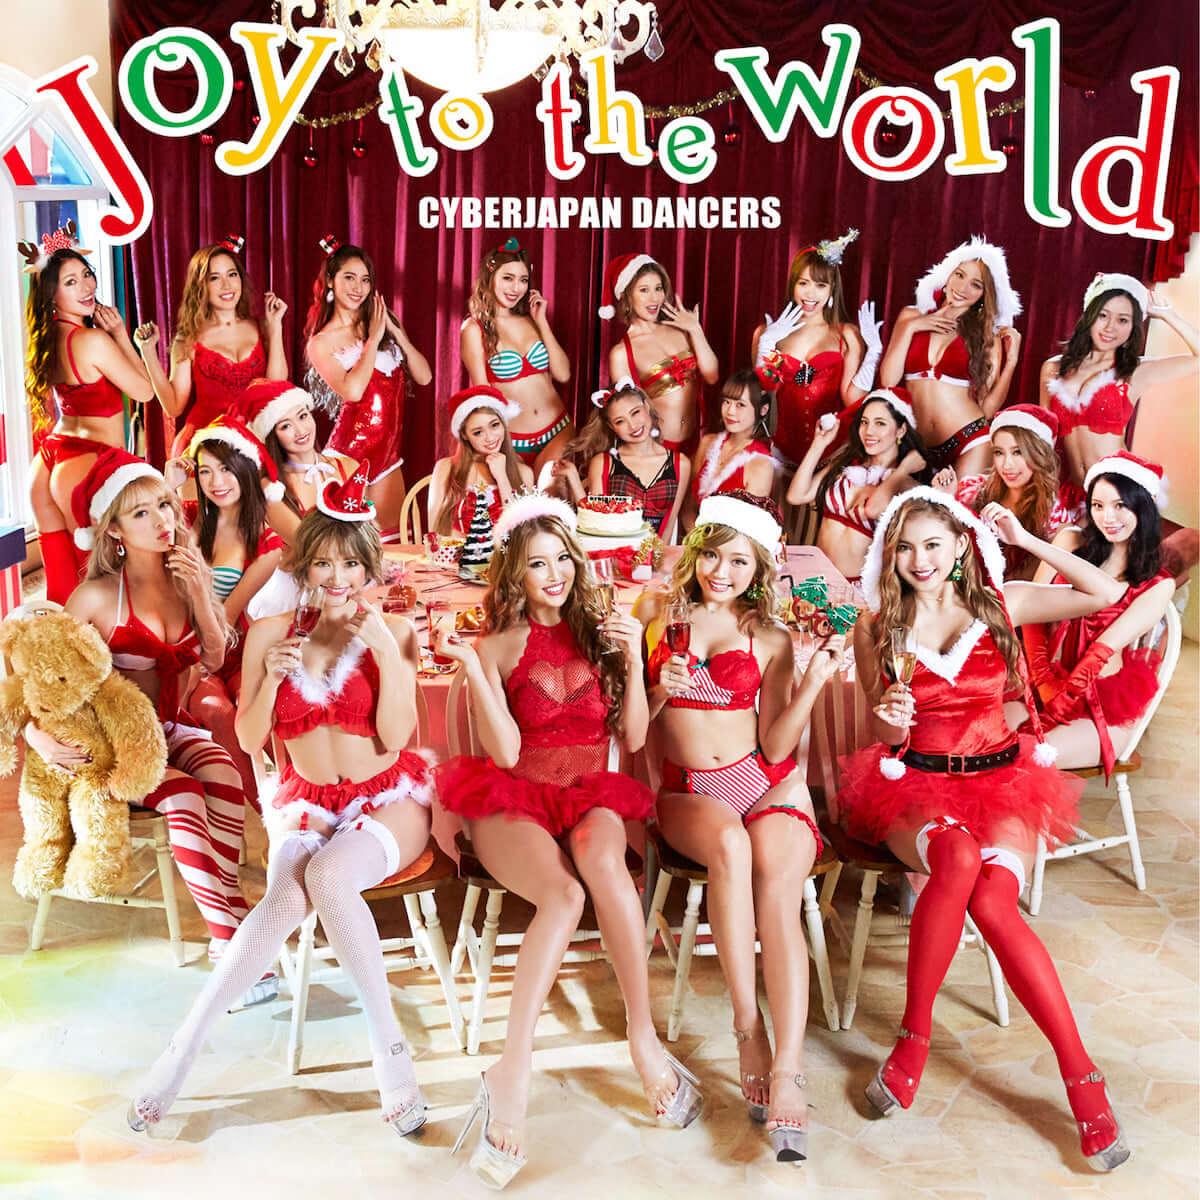 CYBERJAPAN DANCERS、21人ビキニサンタが悩殺 「Joy to the world」MVが公開!早速 MVチャート1位に! music181126_cyberjapan_2-1200x1200